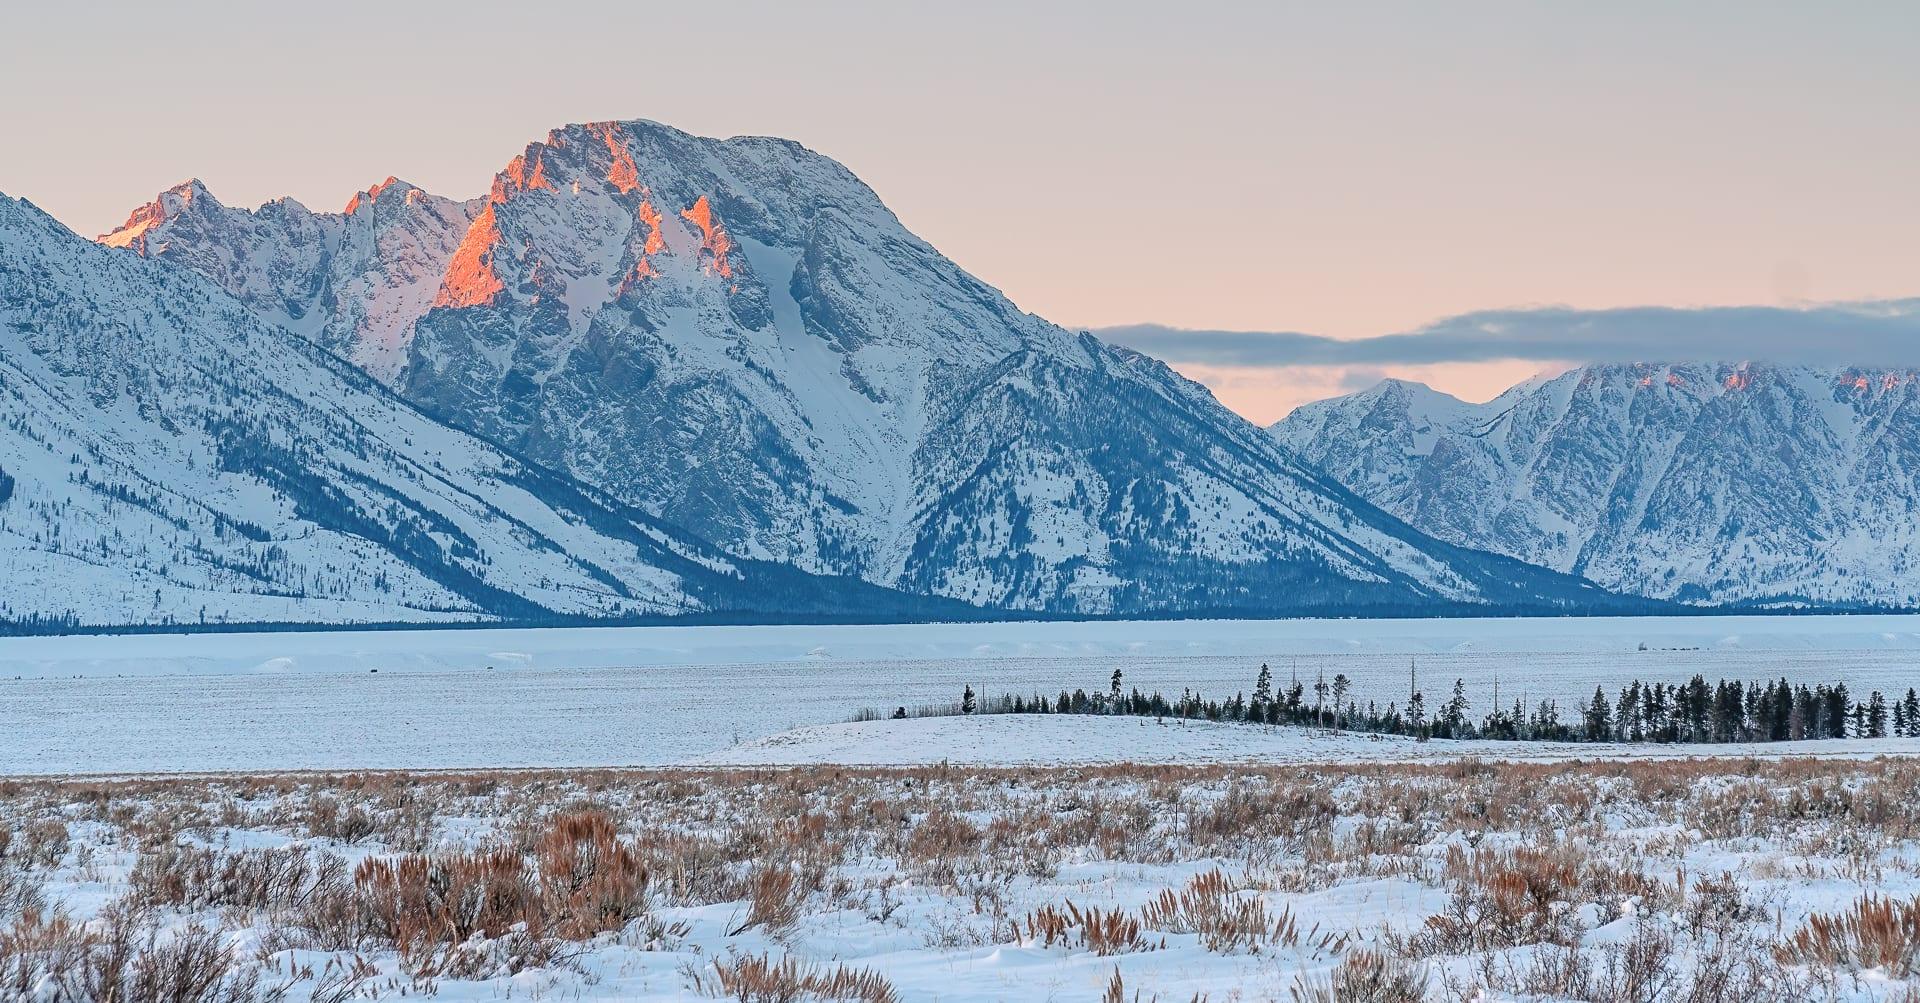 Frozen Jackson Lake and Mount Moran in winter at sunset